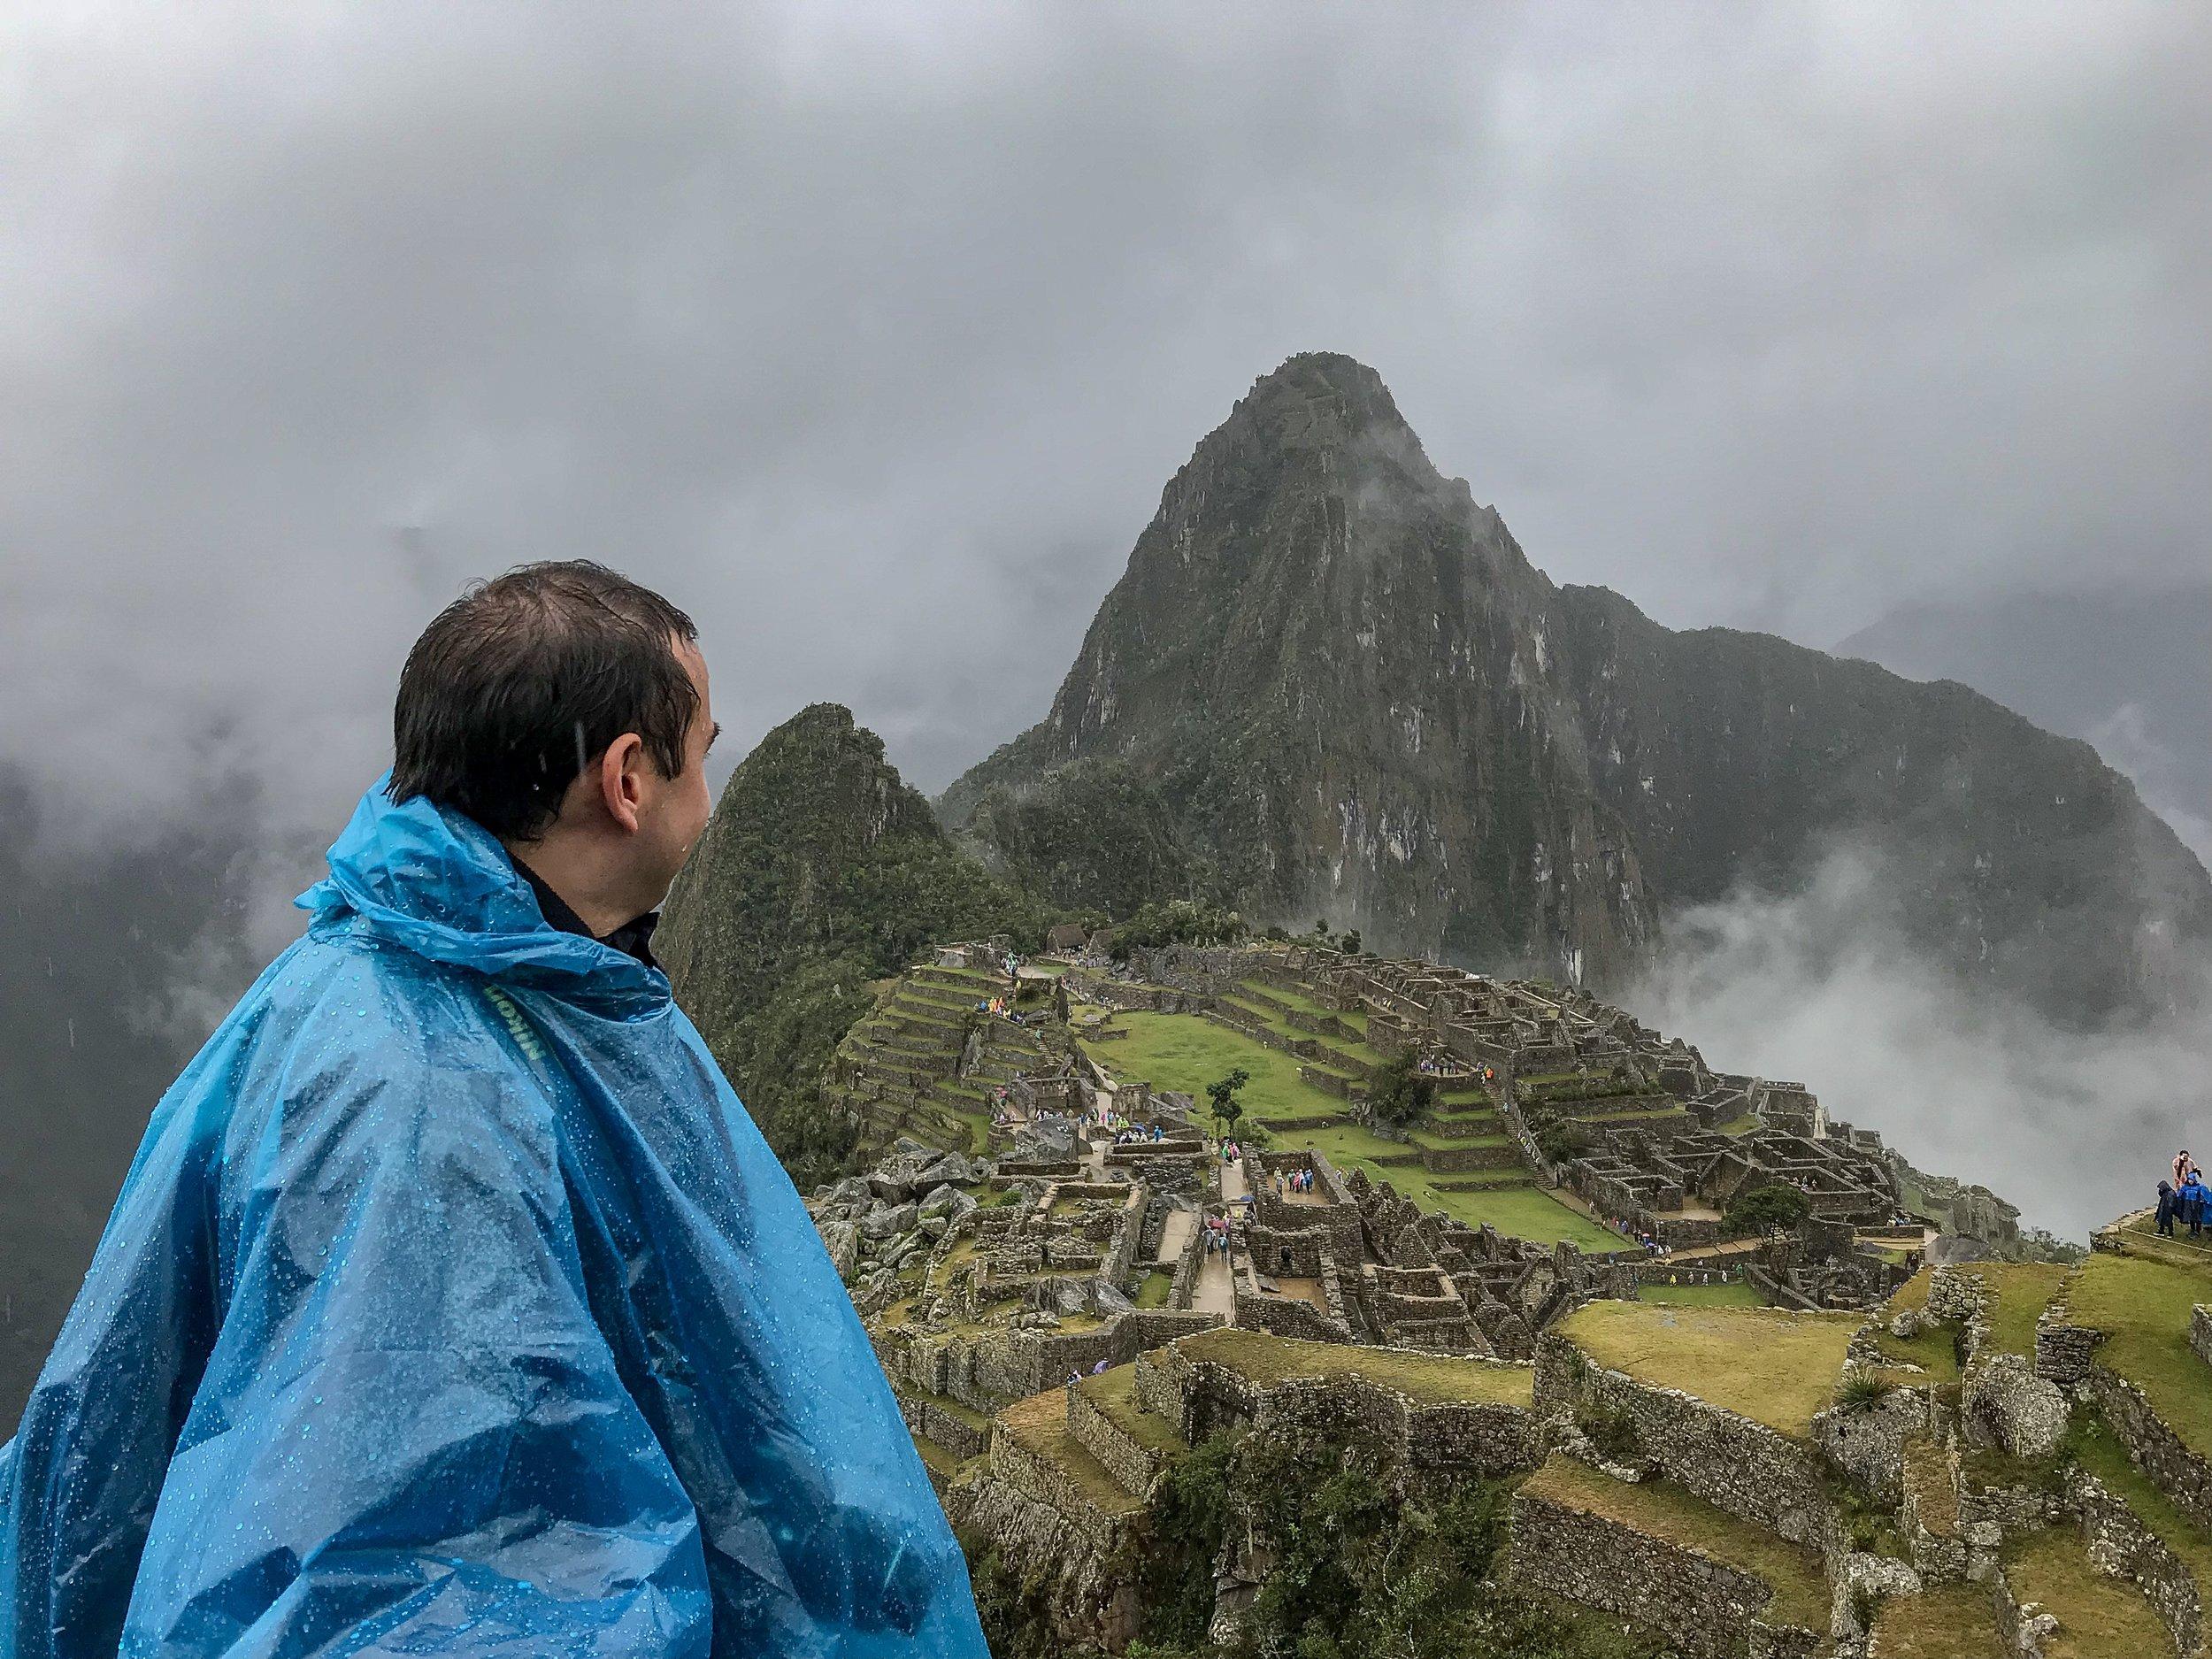 Looking toward Machu Picchu